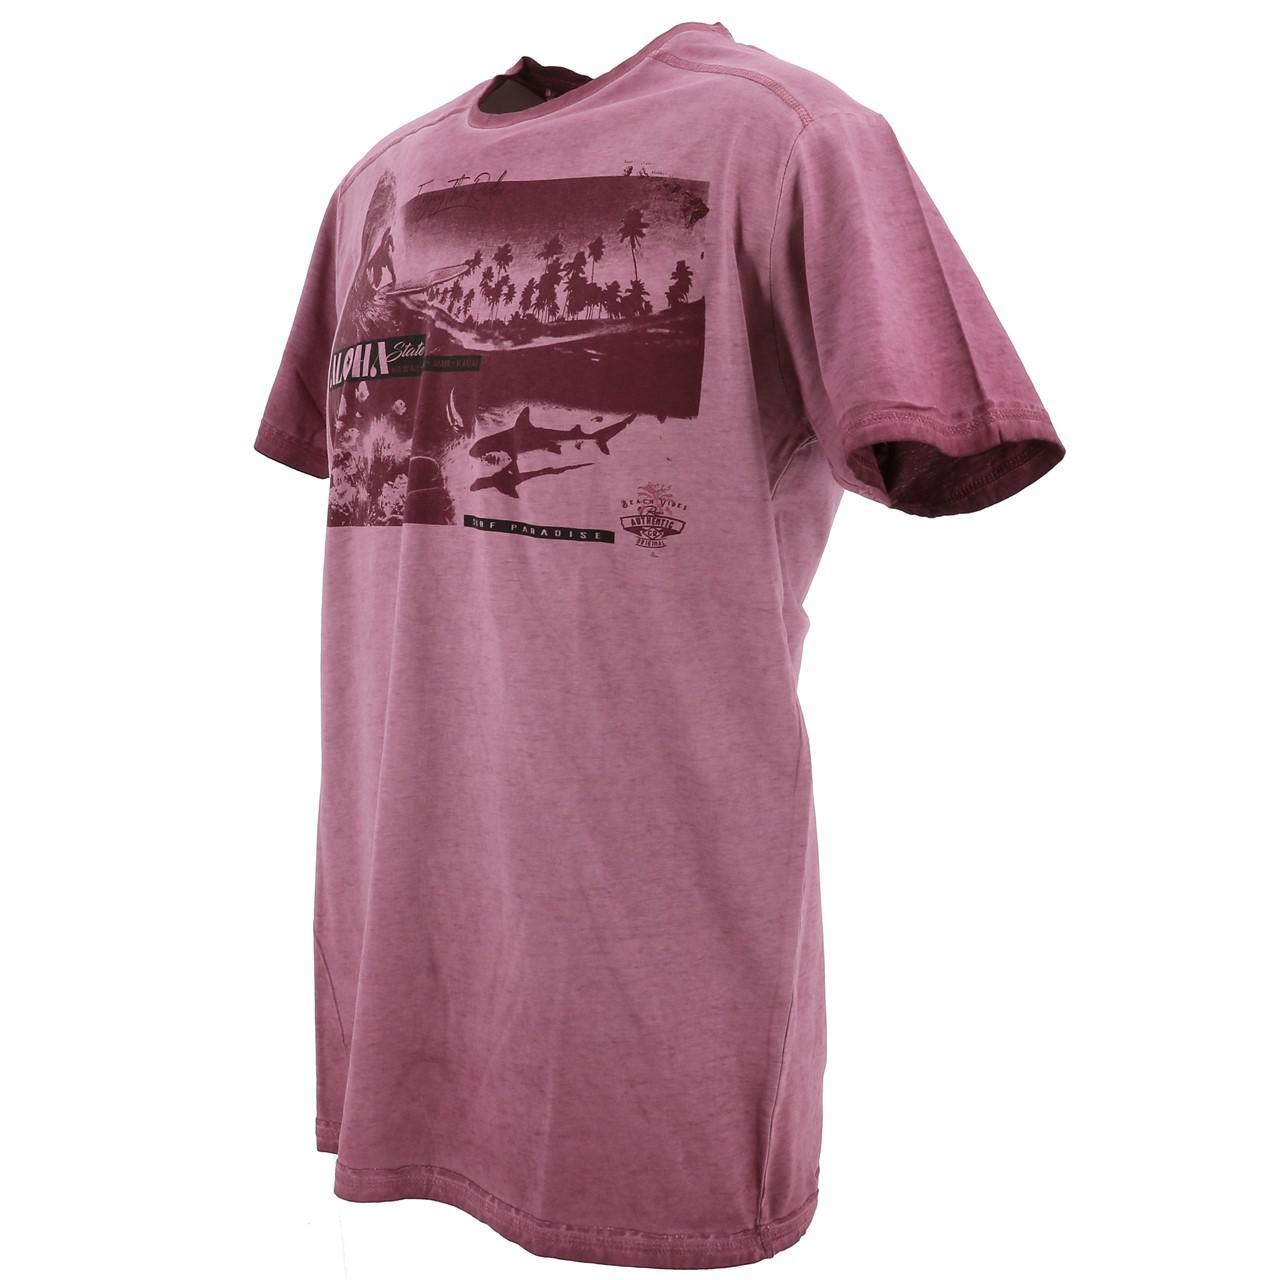 Short-Sleeve-T-Shirt-RMS-26-Shark-Wine-Mc-Tee-Red-18023-New thumbnail 4